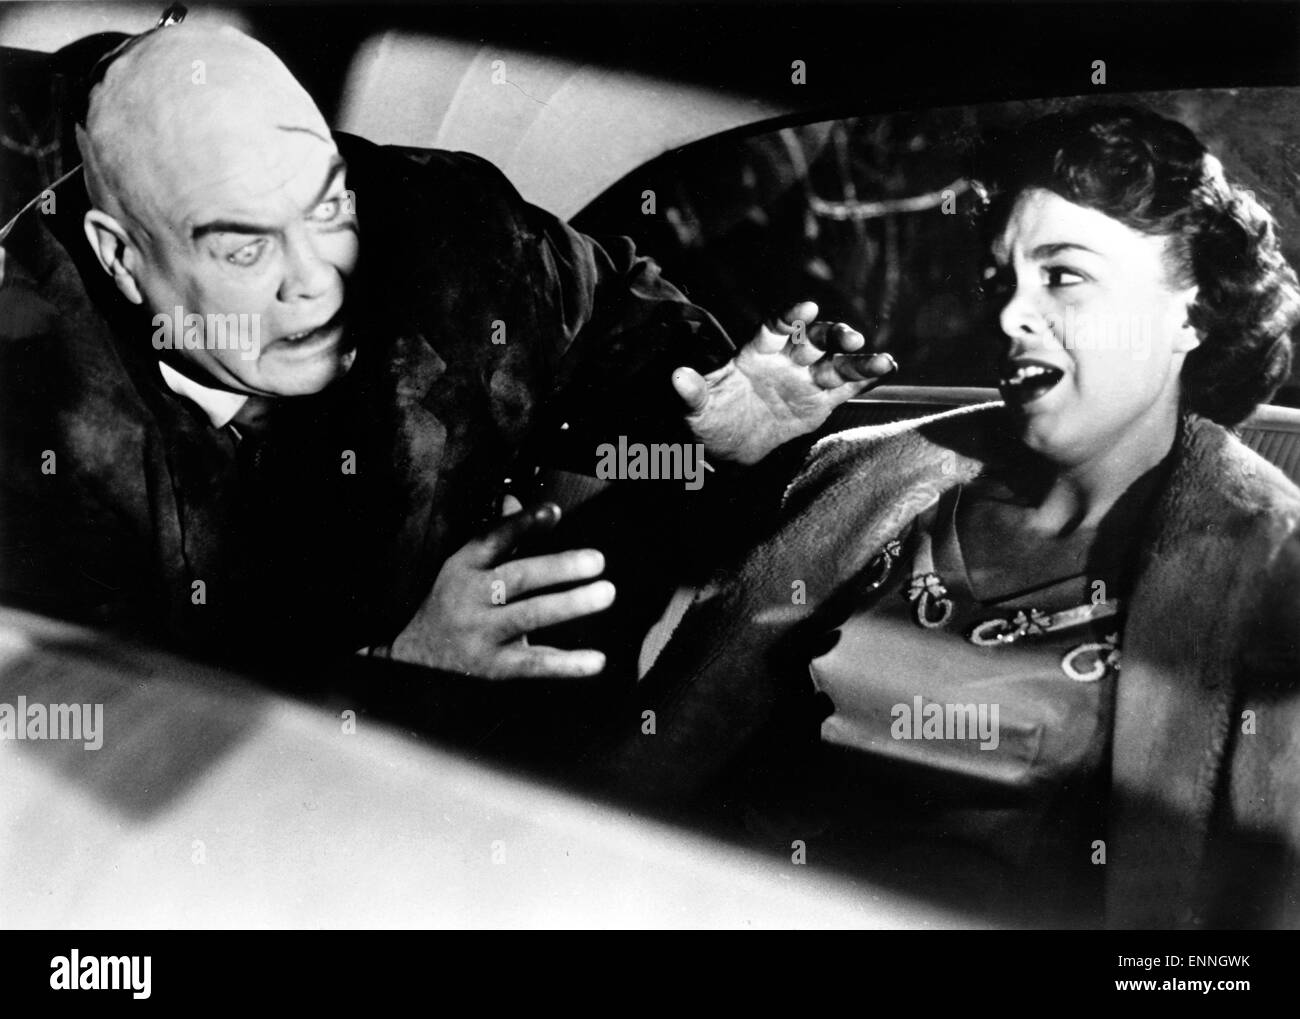 Plan 9 from Outer Space, USA 1959, Regie: Edward D. Wood Jr., Darsteller: Mona McKinnon, Tor Johnson - Stock Image